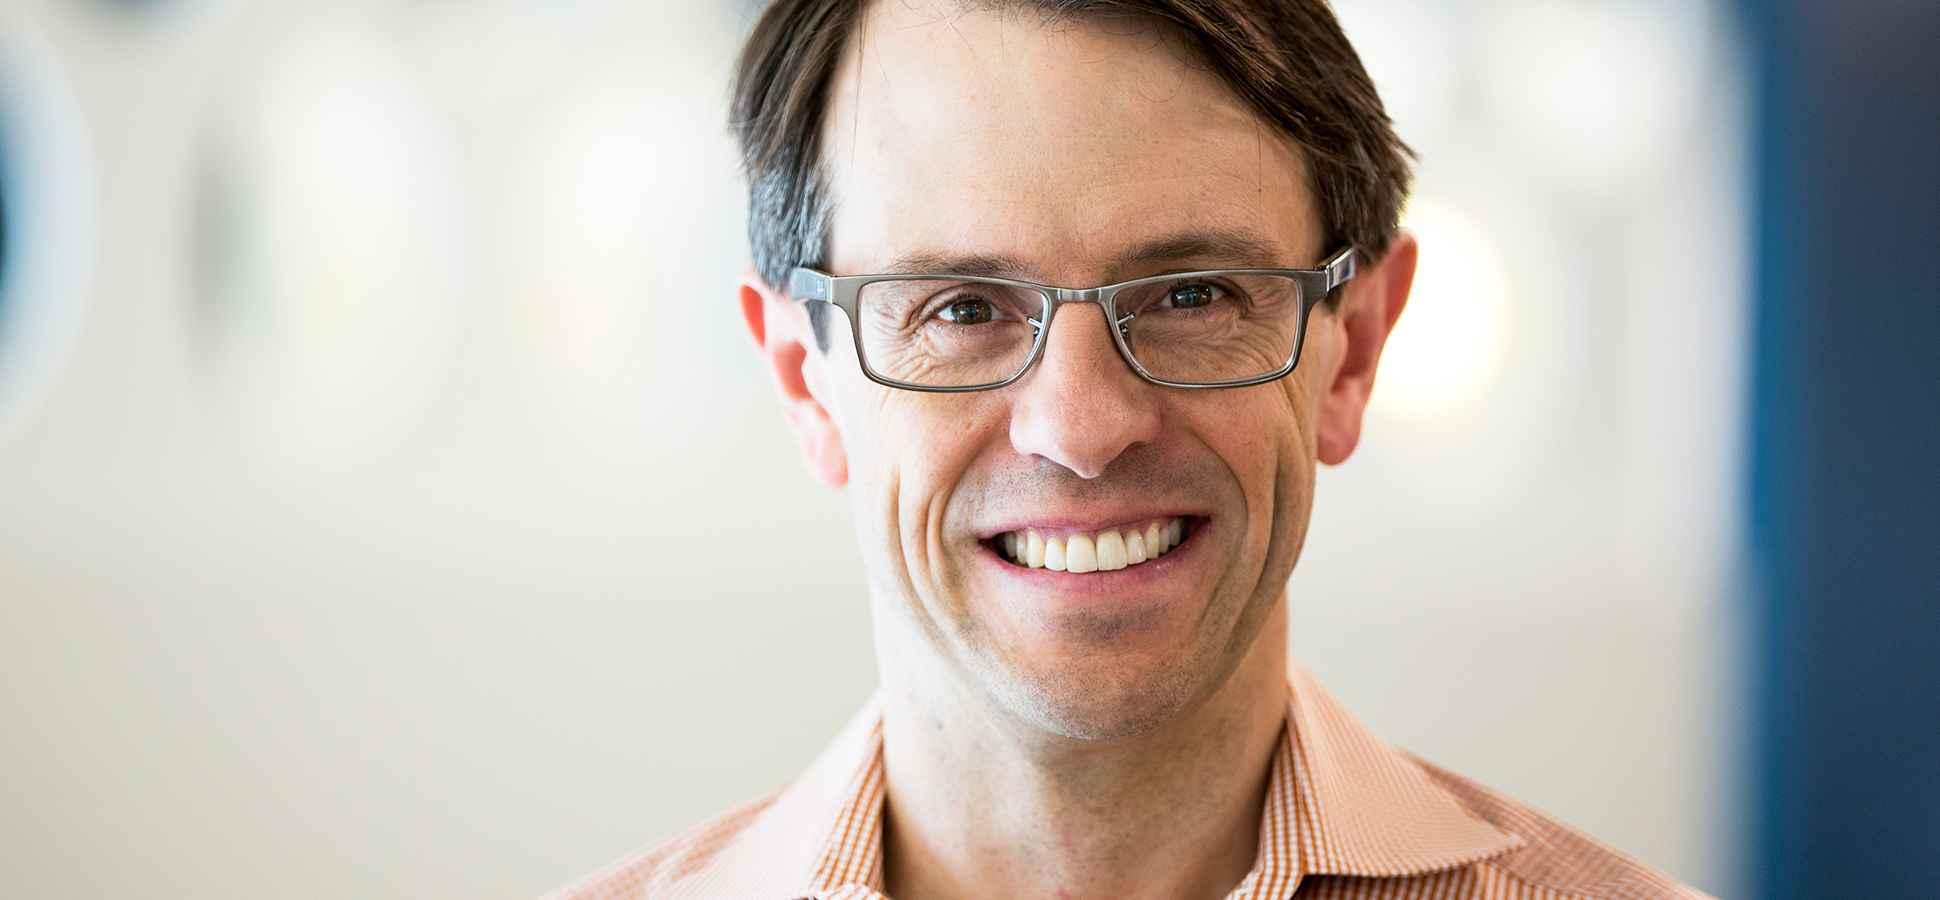 How to Build a $3 Billion Company: Steve Conine, Co-founder of Wayfair.com